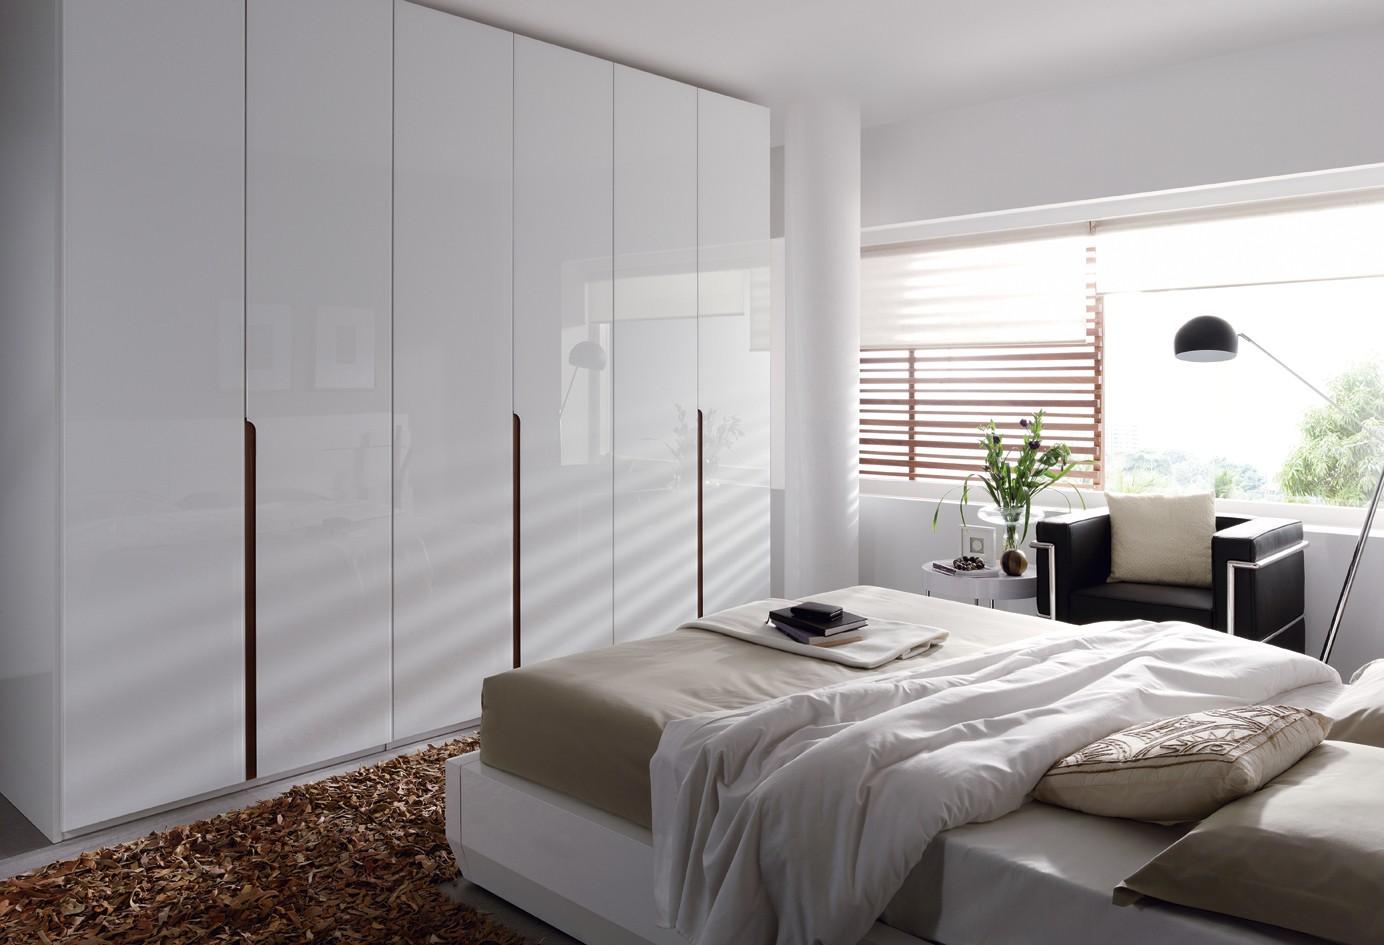 Imagenes armarios modernos nexo de piferrer built de for Armarios dormitorio modernos